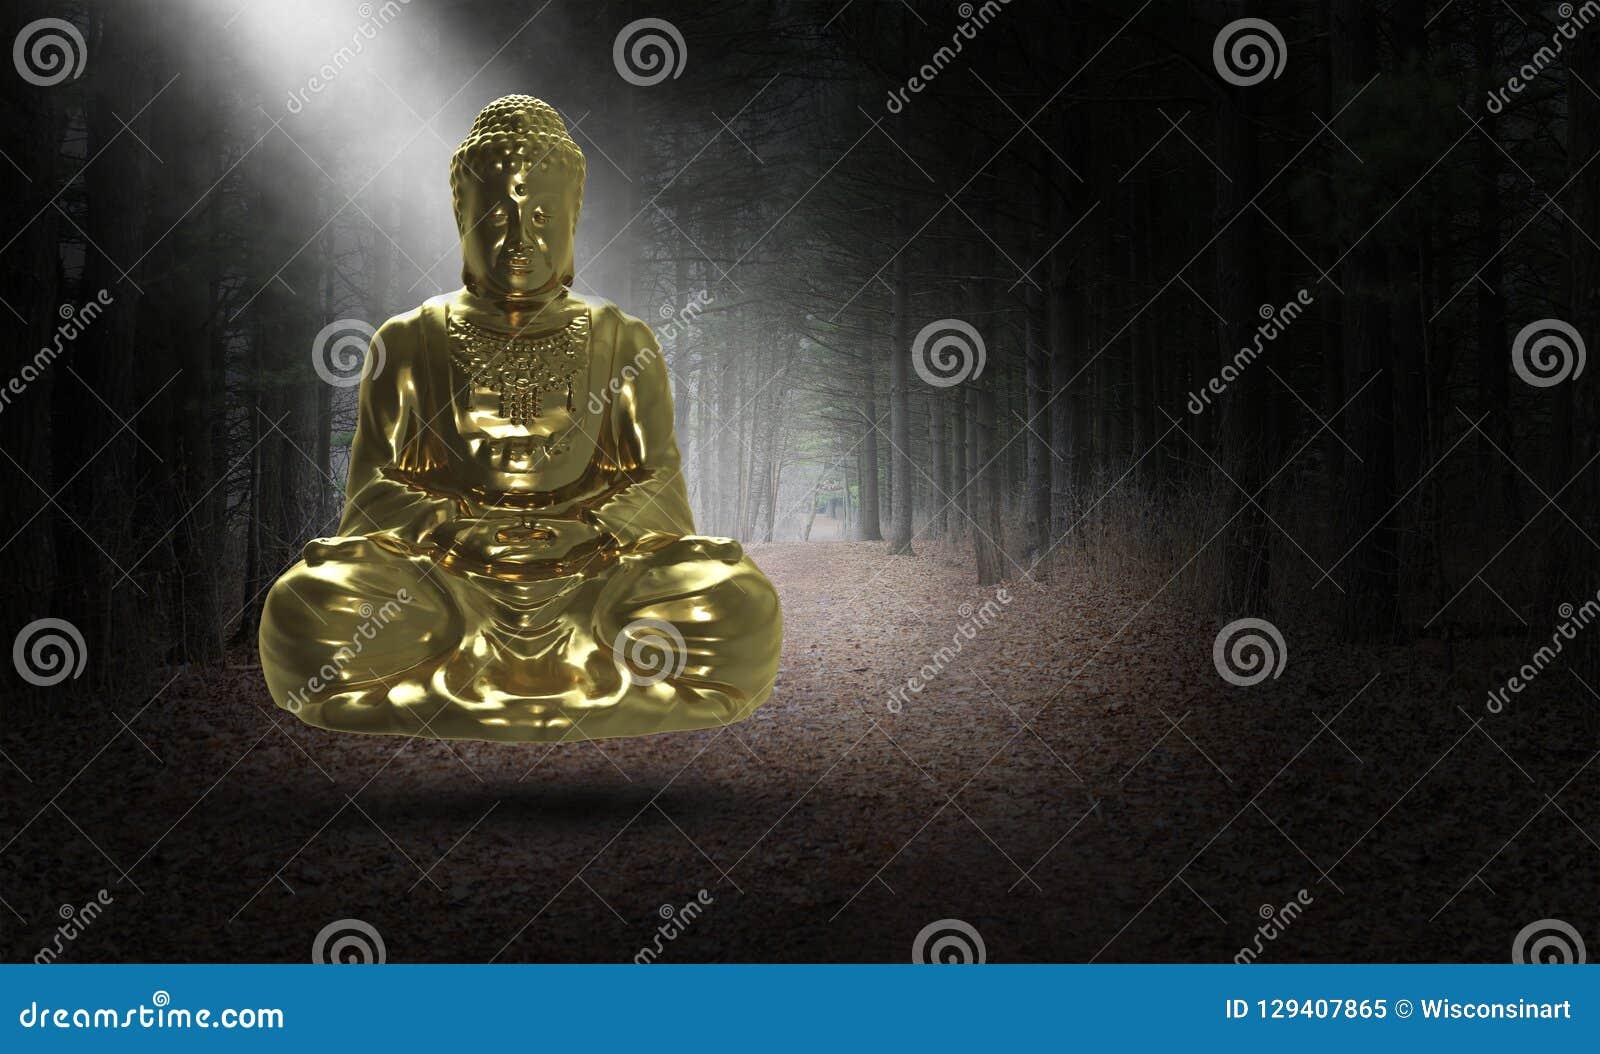 Buda surrealista, Buddist, budismo, estatua, religión